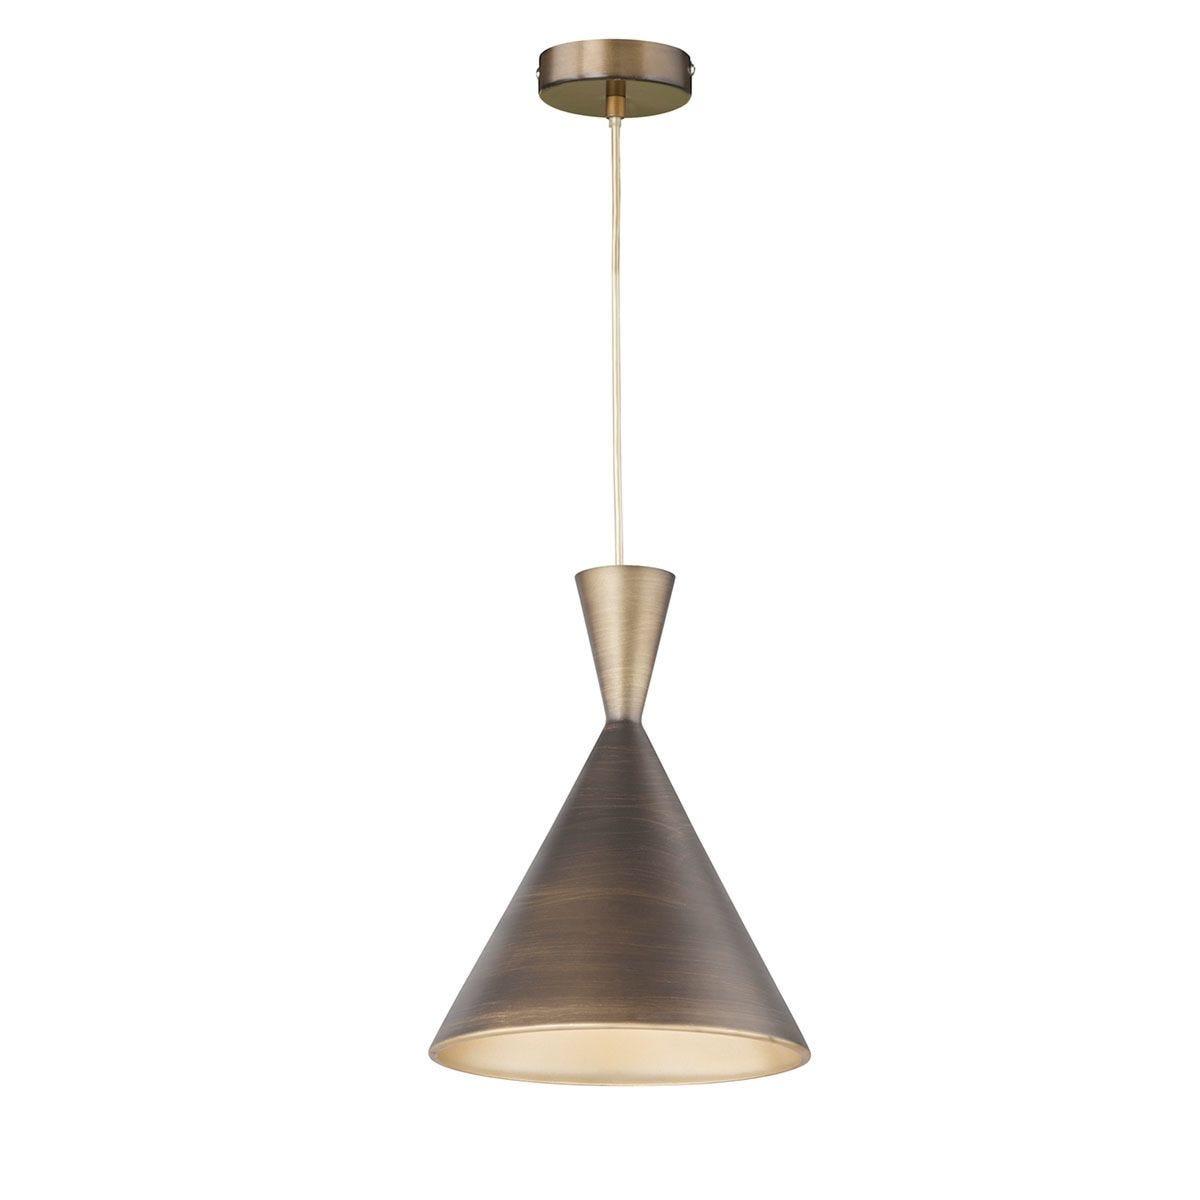 Wofi Anur Pendant Ceiling Light - Brown